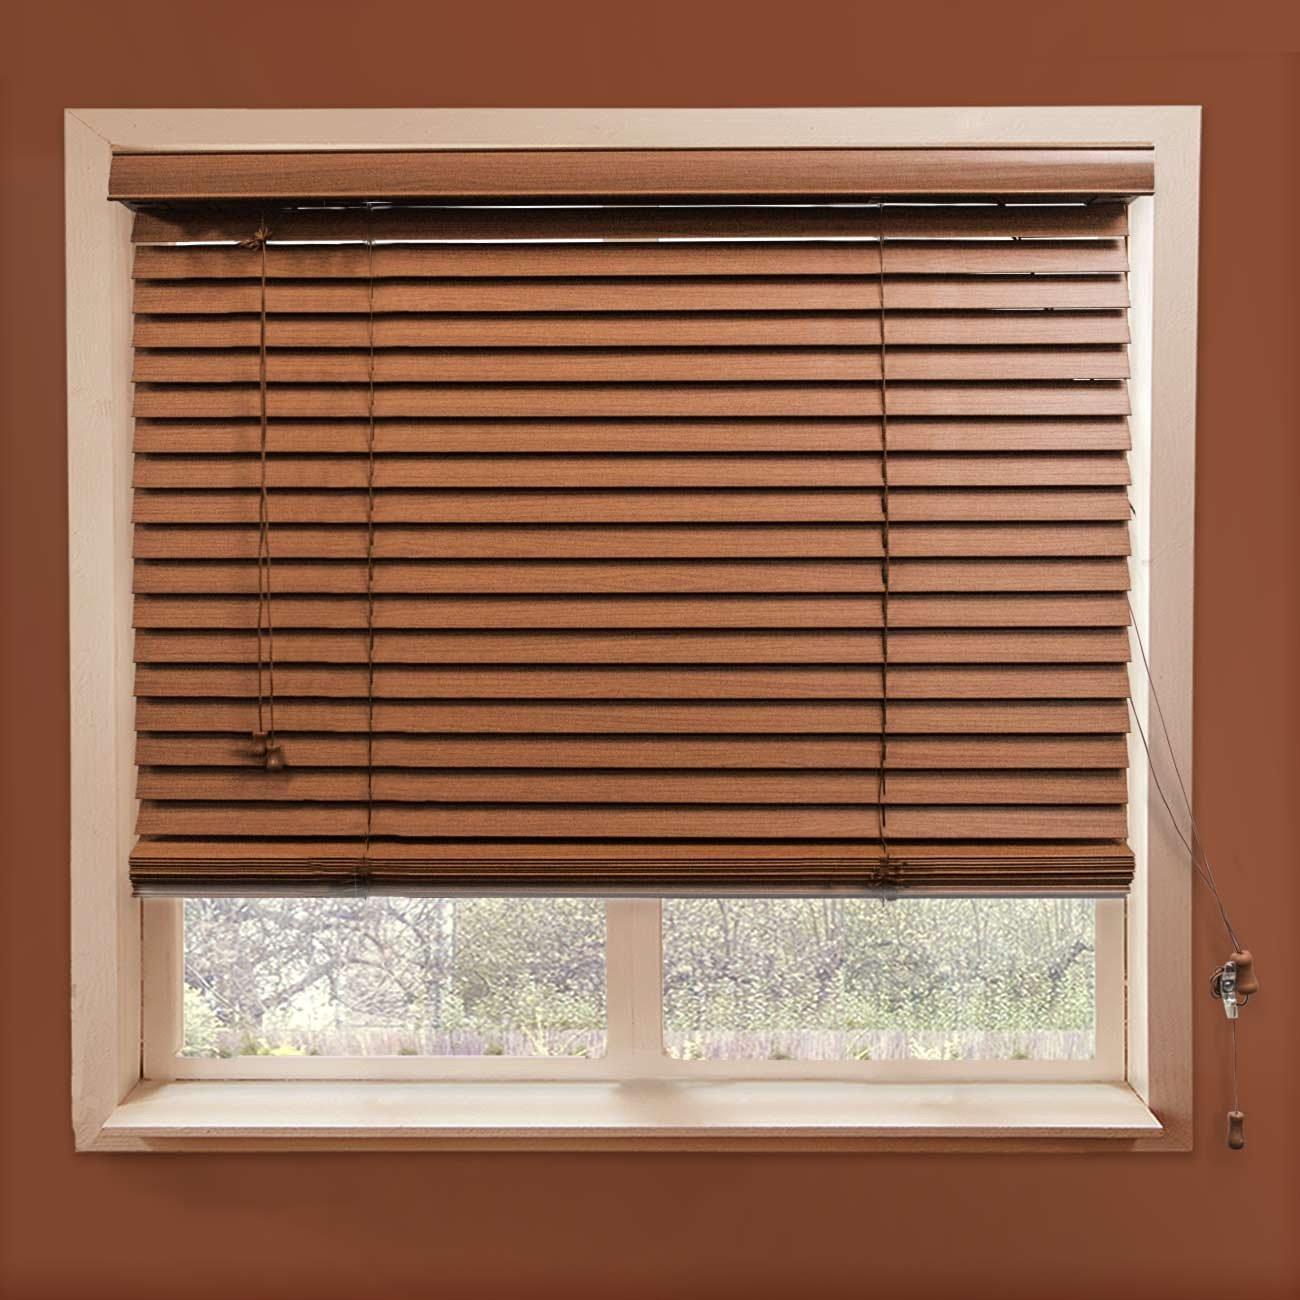 "Chicology Faux Blind 2"" Slats Realistic Wood Grain Embossing Horizontal Venetian, 39"" x 64"", Simply Brown"